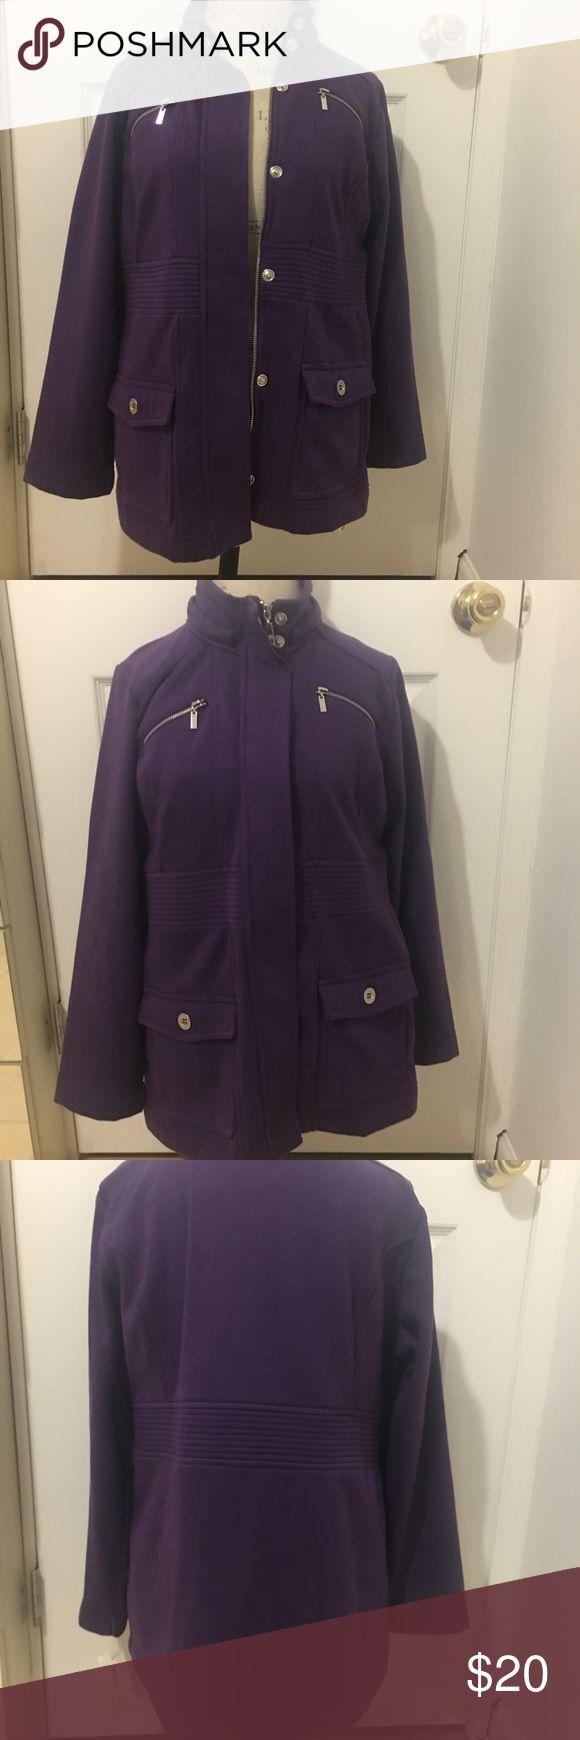 Style & Co Zip Sweatshirt Jacket-like zip up sweatshirt. Super comfy! Brand new. Open to reasonable offers. Please note this is petite size Large!! Style & Co Tops Sweatshirts & Hoodies